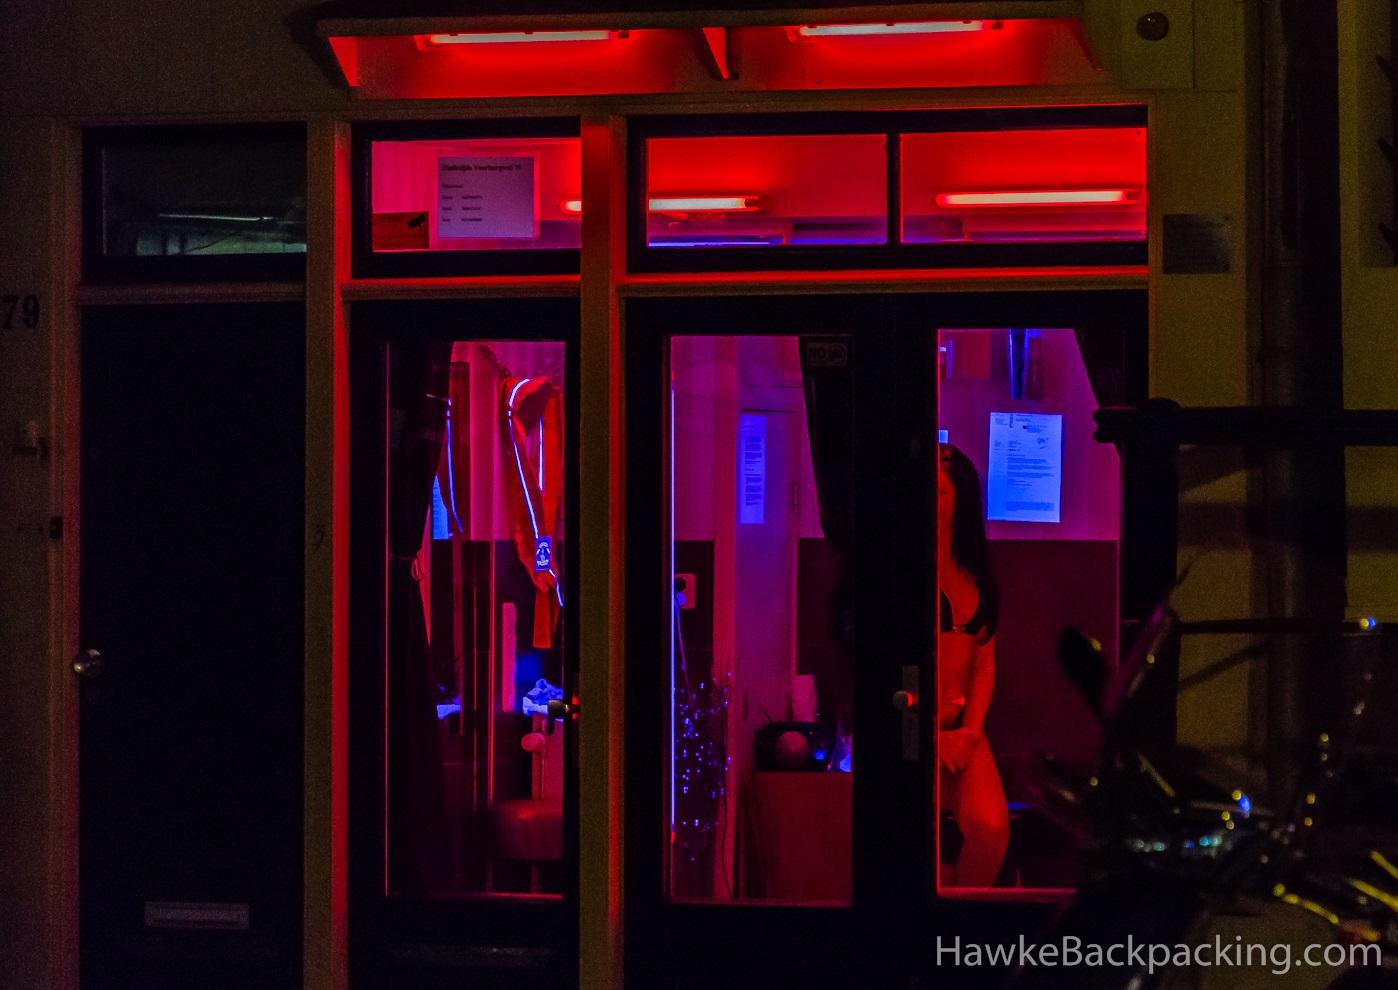 Amsterdam Hawkebackpacking Com